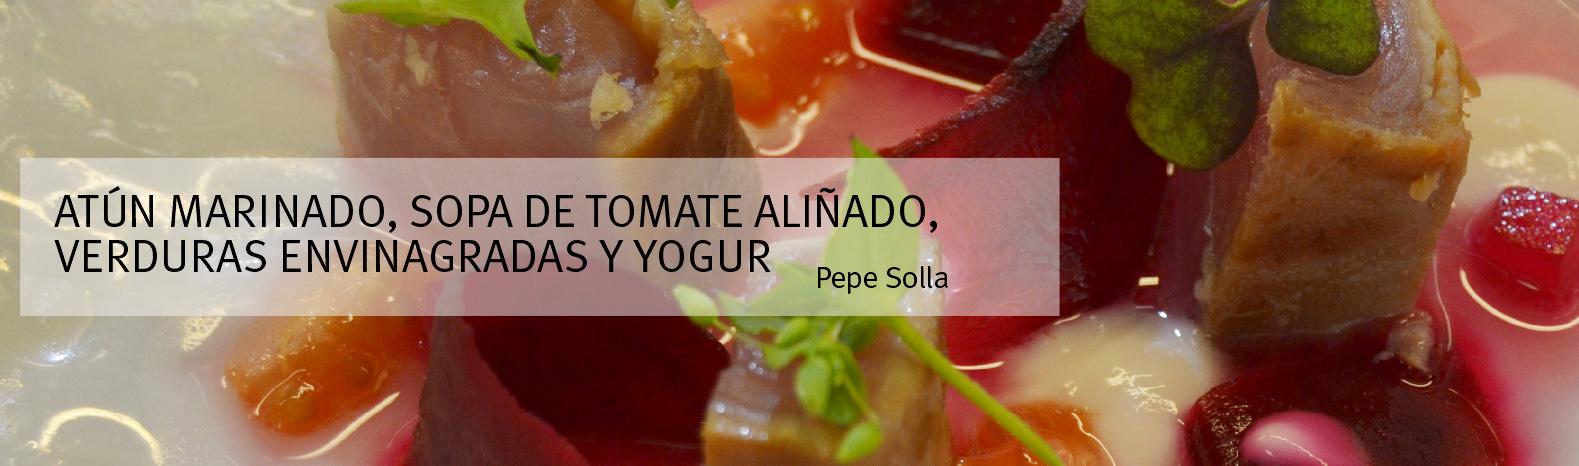 cociña_menu_atun_ok_w